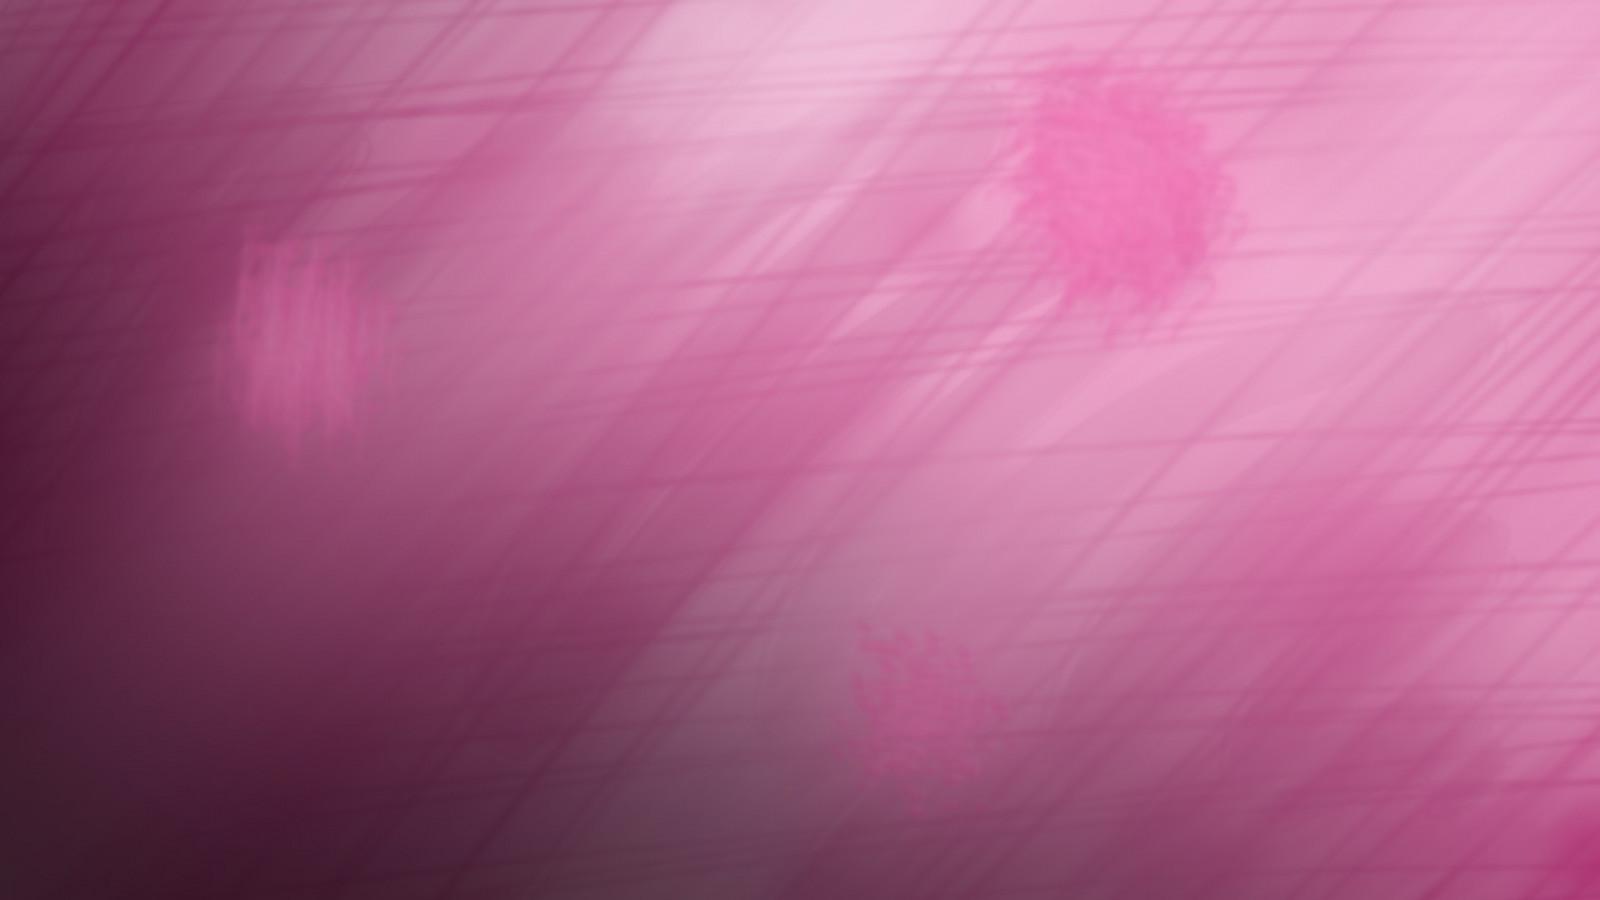 Wallpaper Ungu Tekstur Lingkaran Baris Berwarna Merah Muda